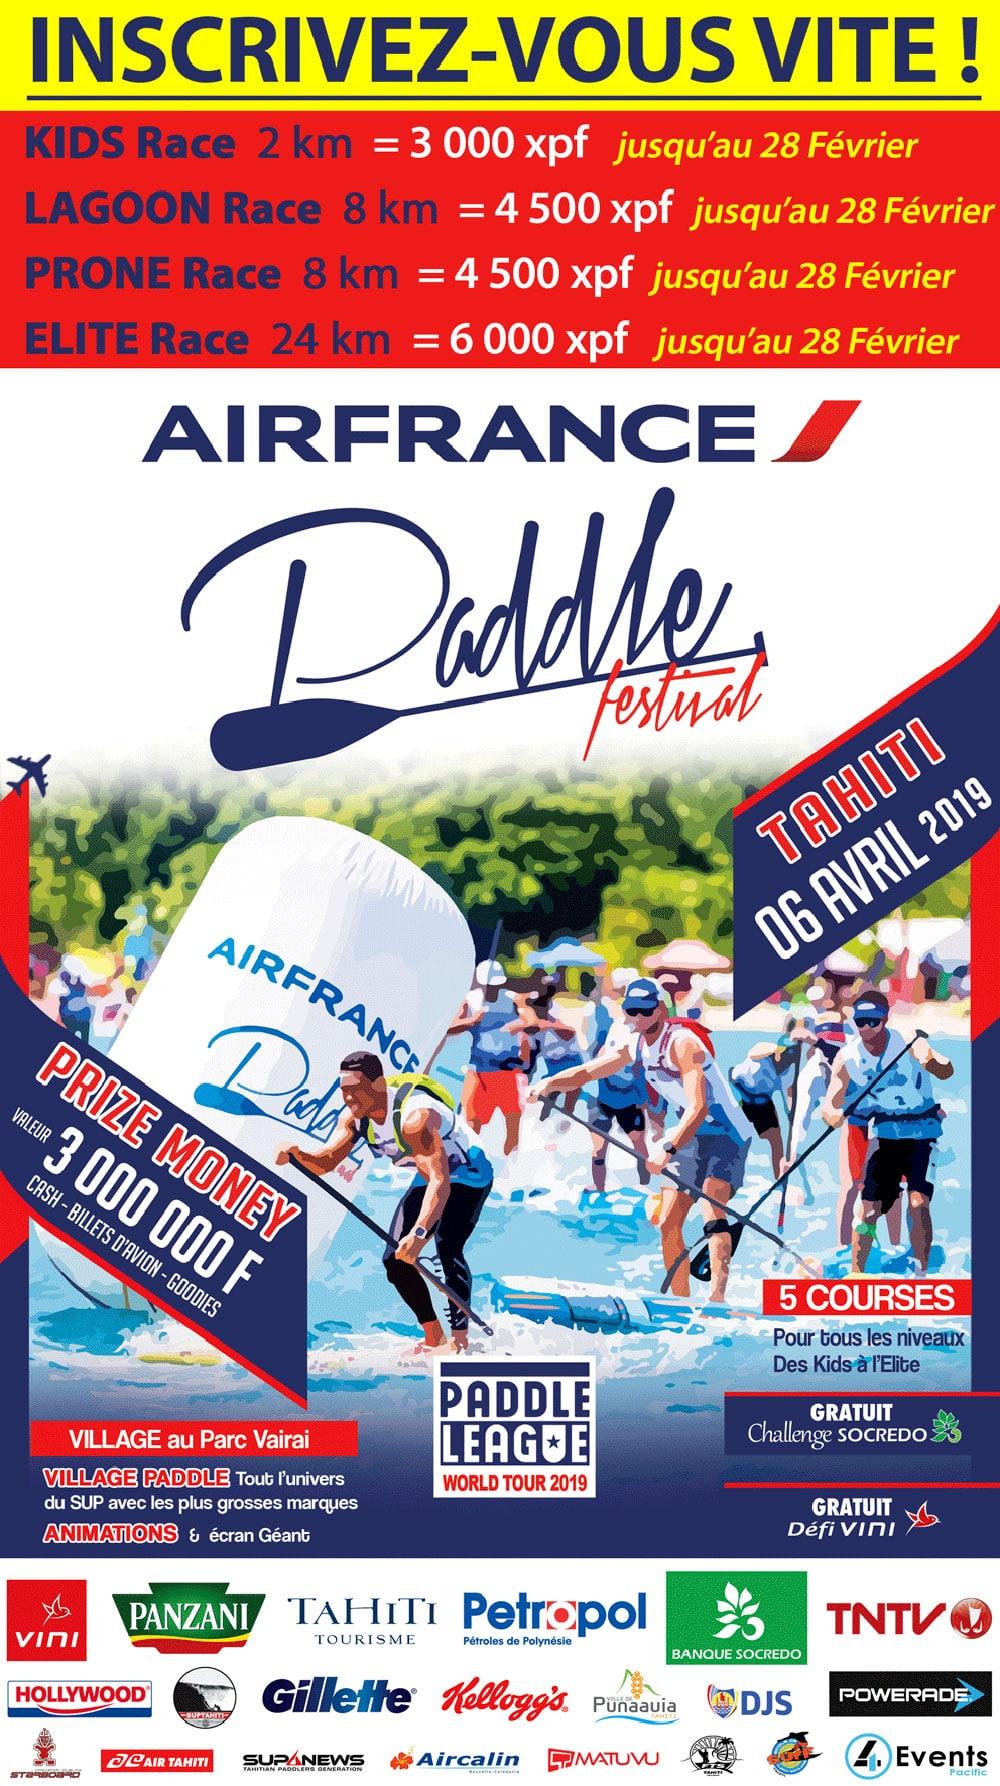 Air France Paddle Festival le samedi 06 Avril 2019 à Tahiti